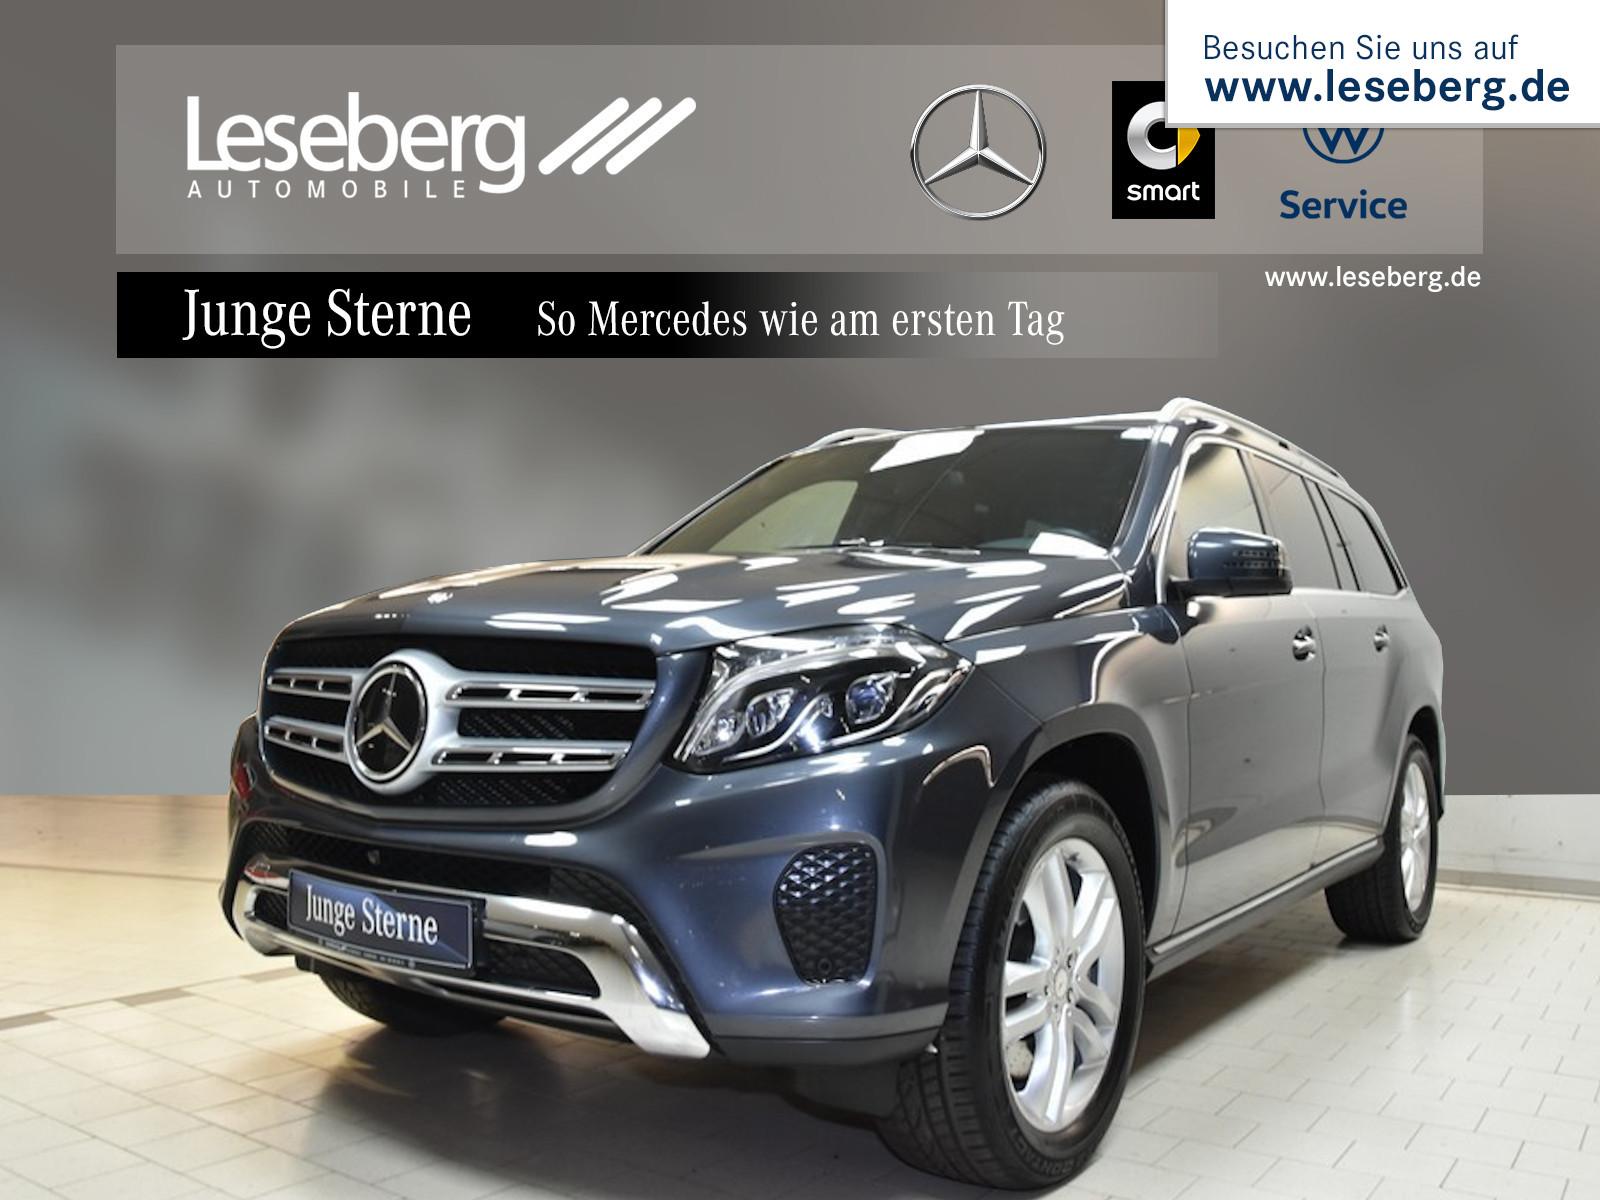 Mercedes-Benz GLS 500 4M Distr/SHD/360°/Fond Entertaiment/AHK, Jahr 2016, petrol